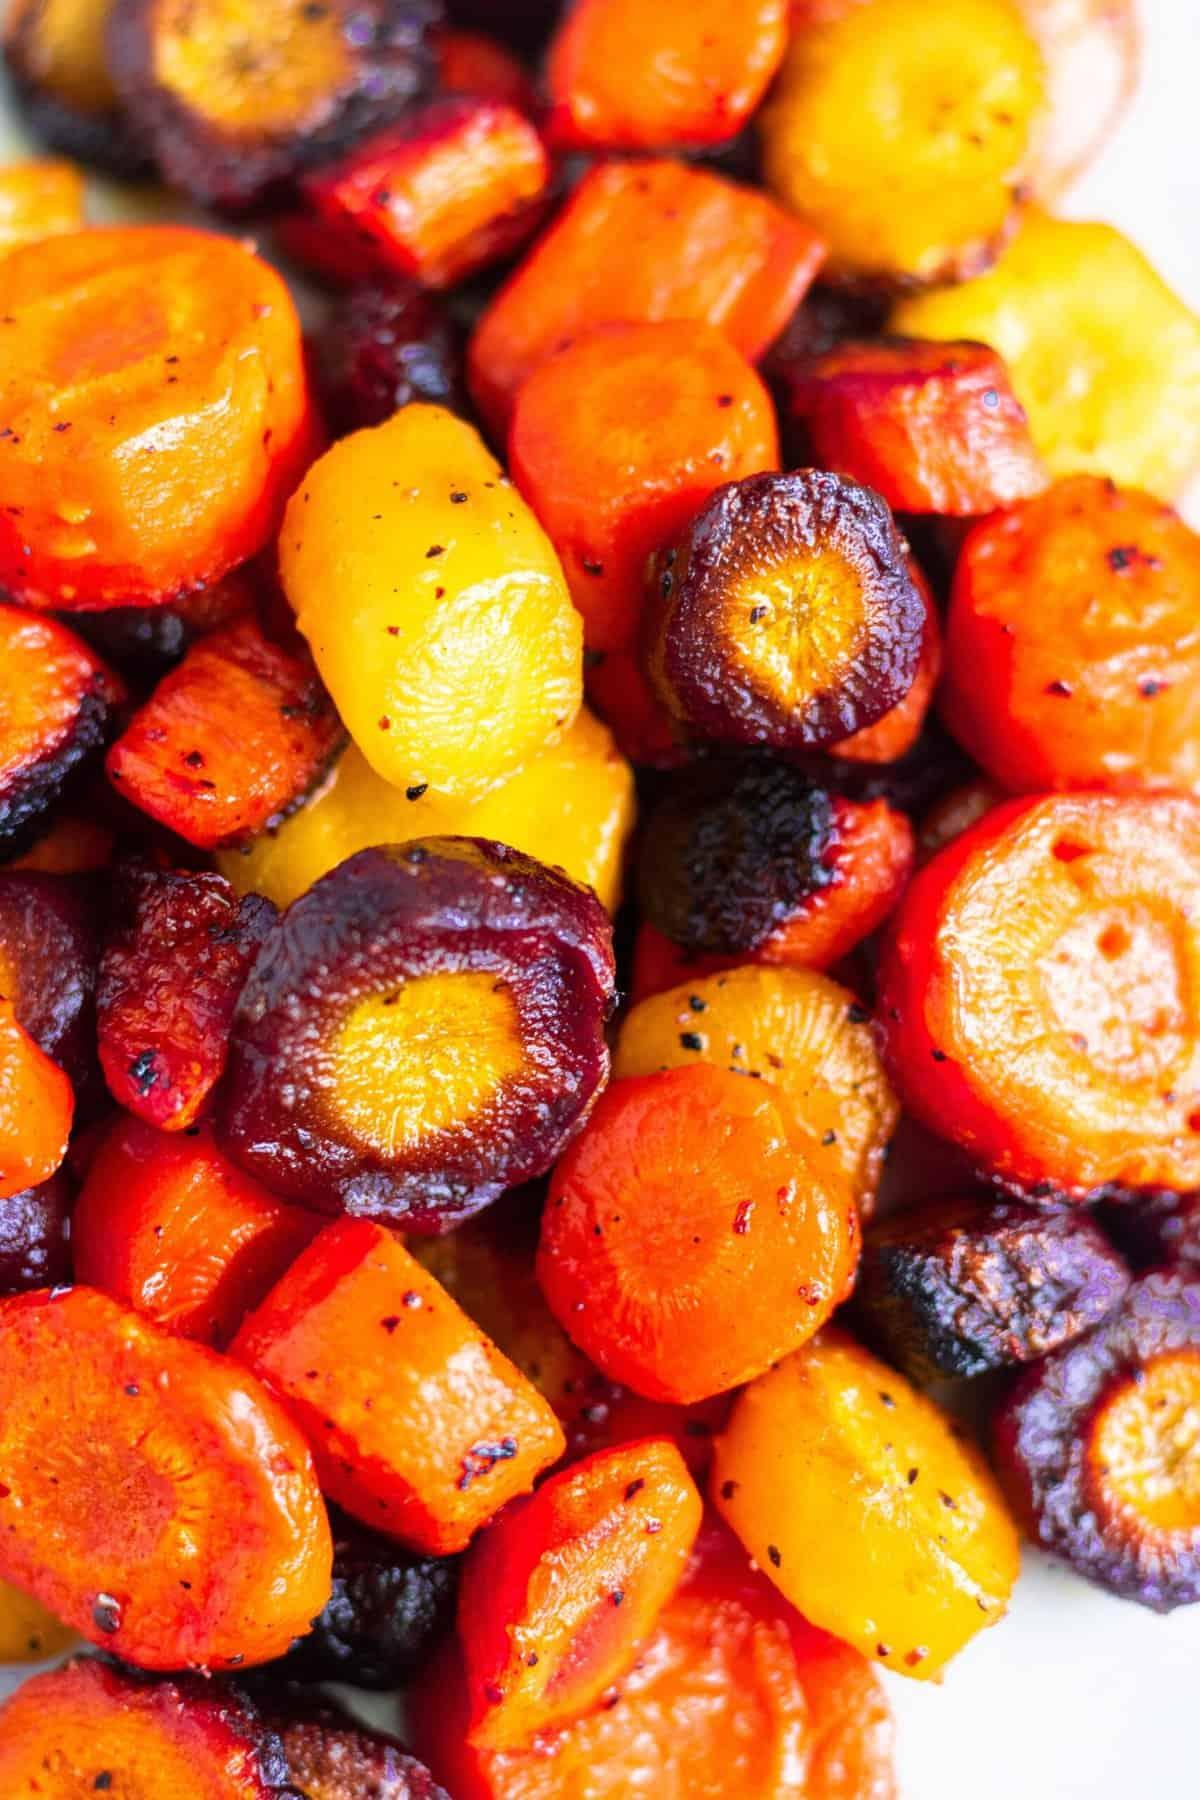 Sauteed Maple Glazed Carrots